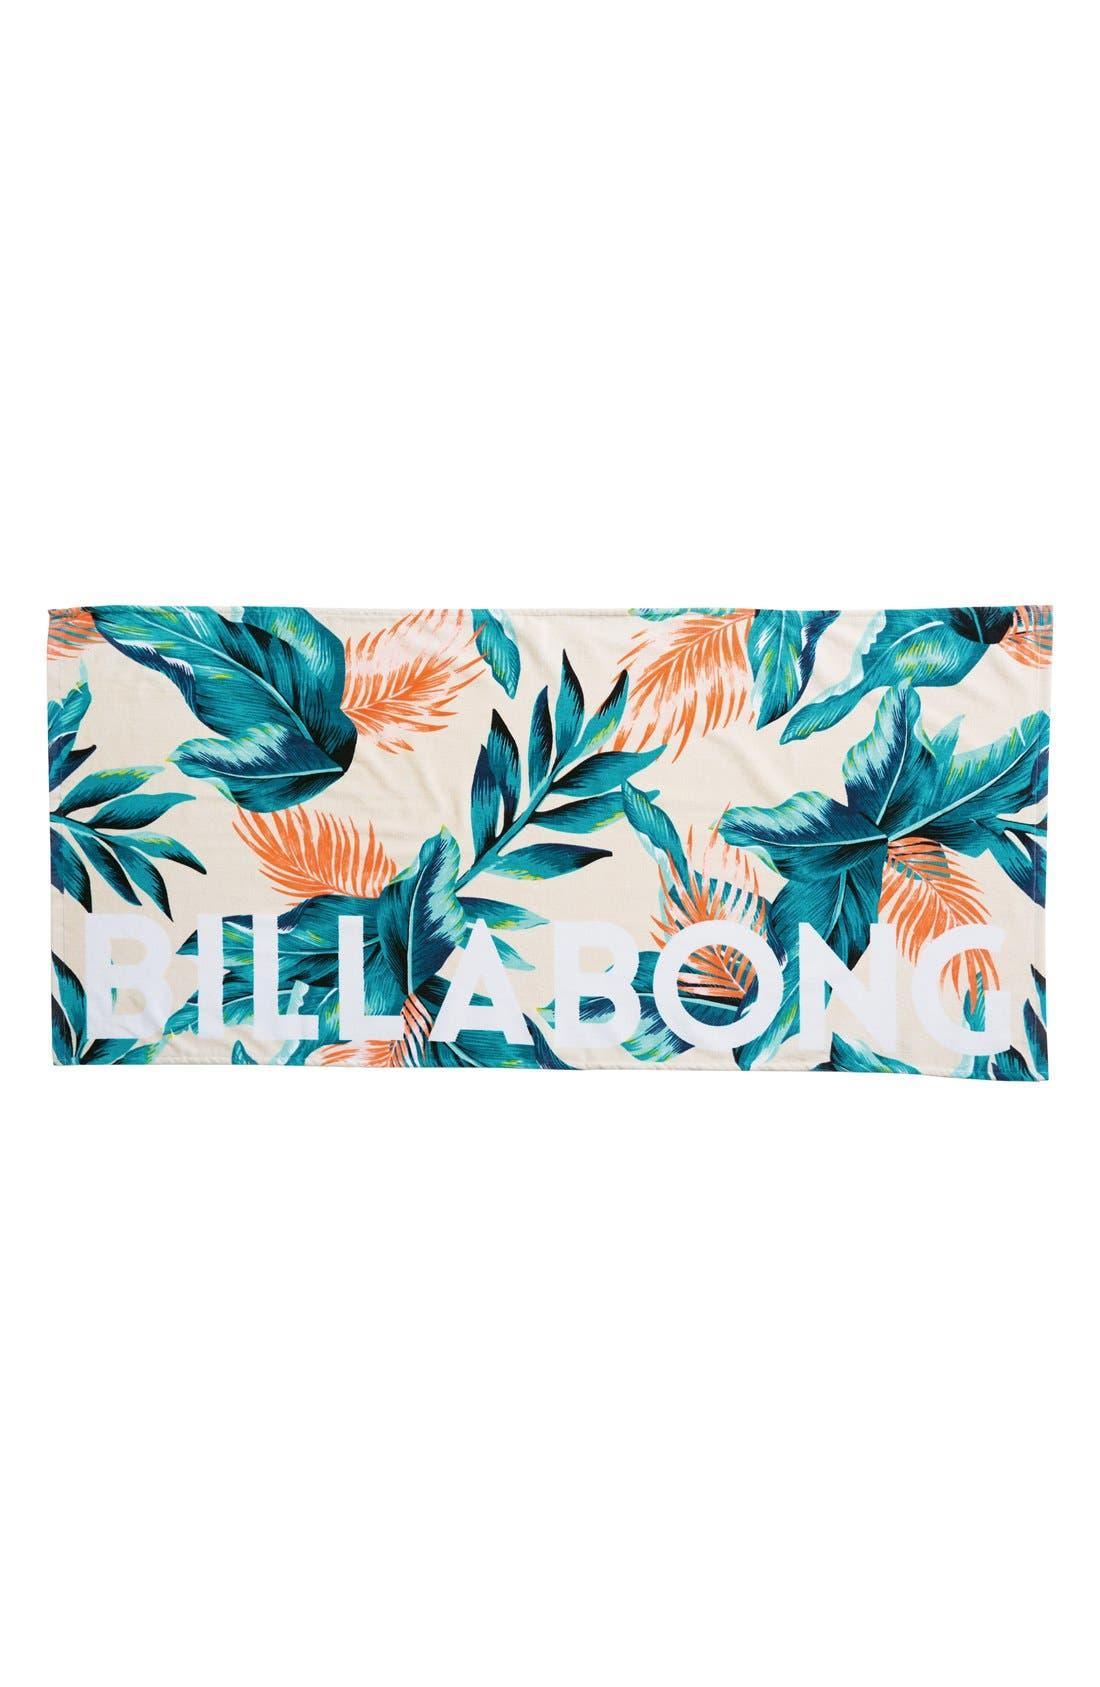 Alternate Image 1 Selected - Billabong 'Sunset Sounds' Cotton Terry Beach Towel